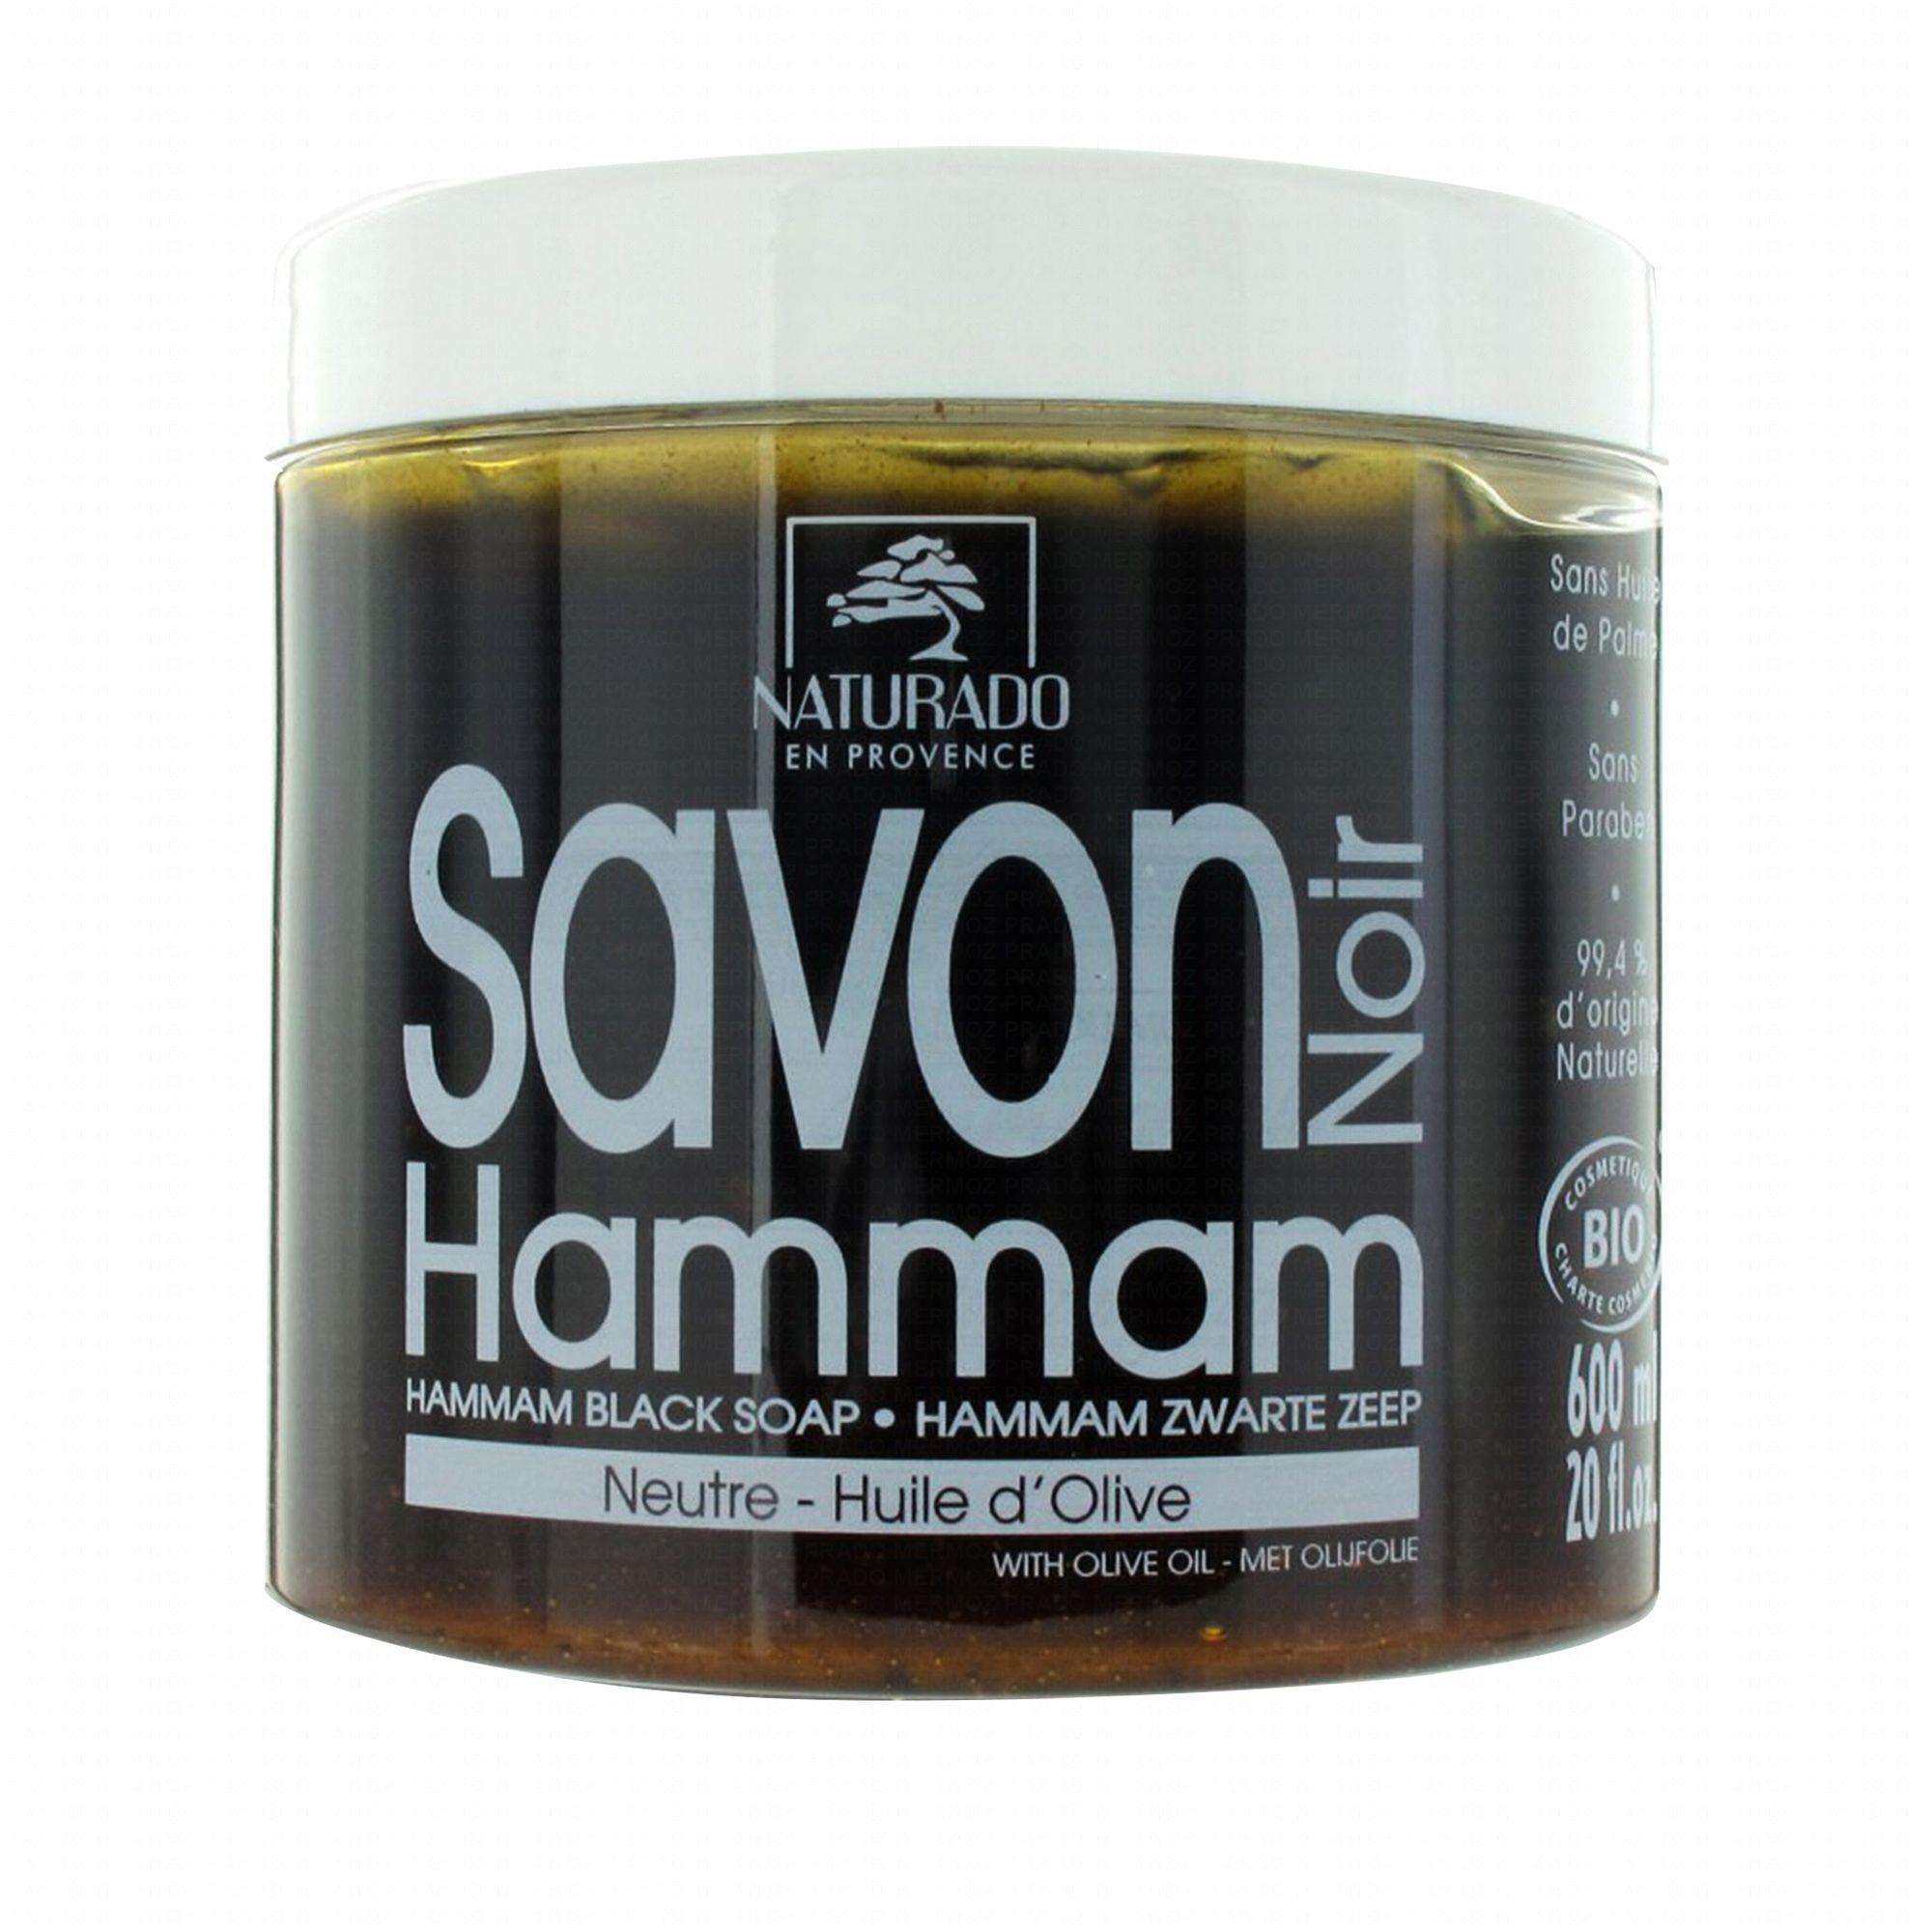 naturado savon noir hammam bio pot 600ml parapharmacie en ligne prado mermoz. Black Bedroom Furniture Sets. Home Design Ideas